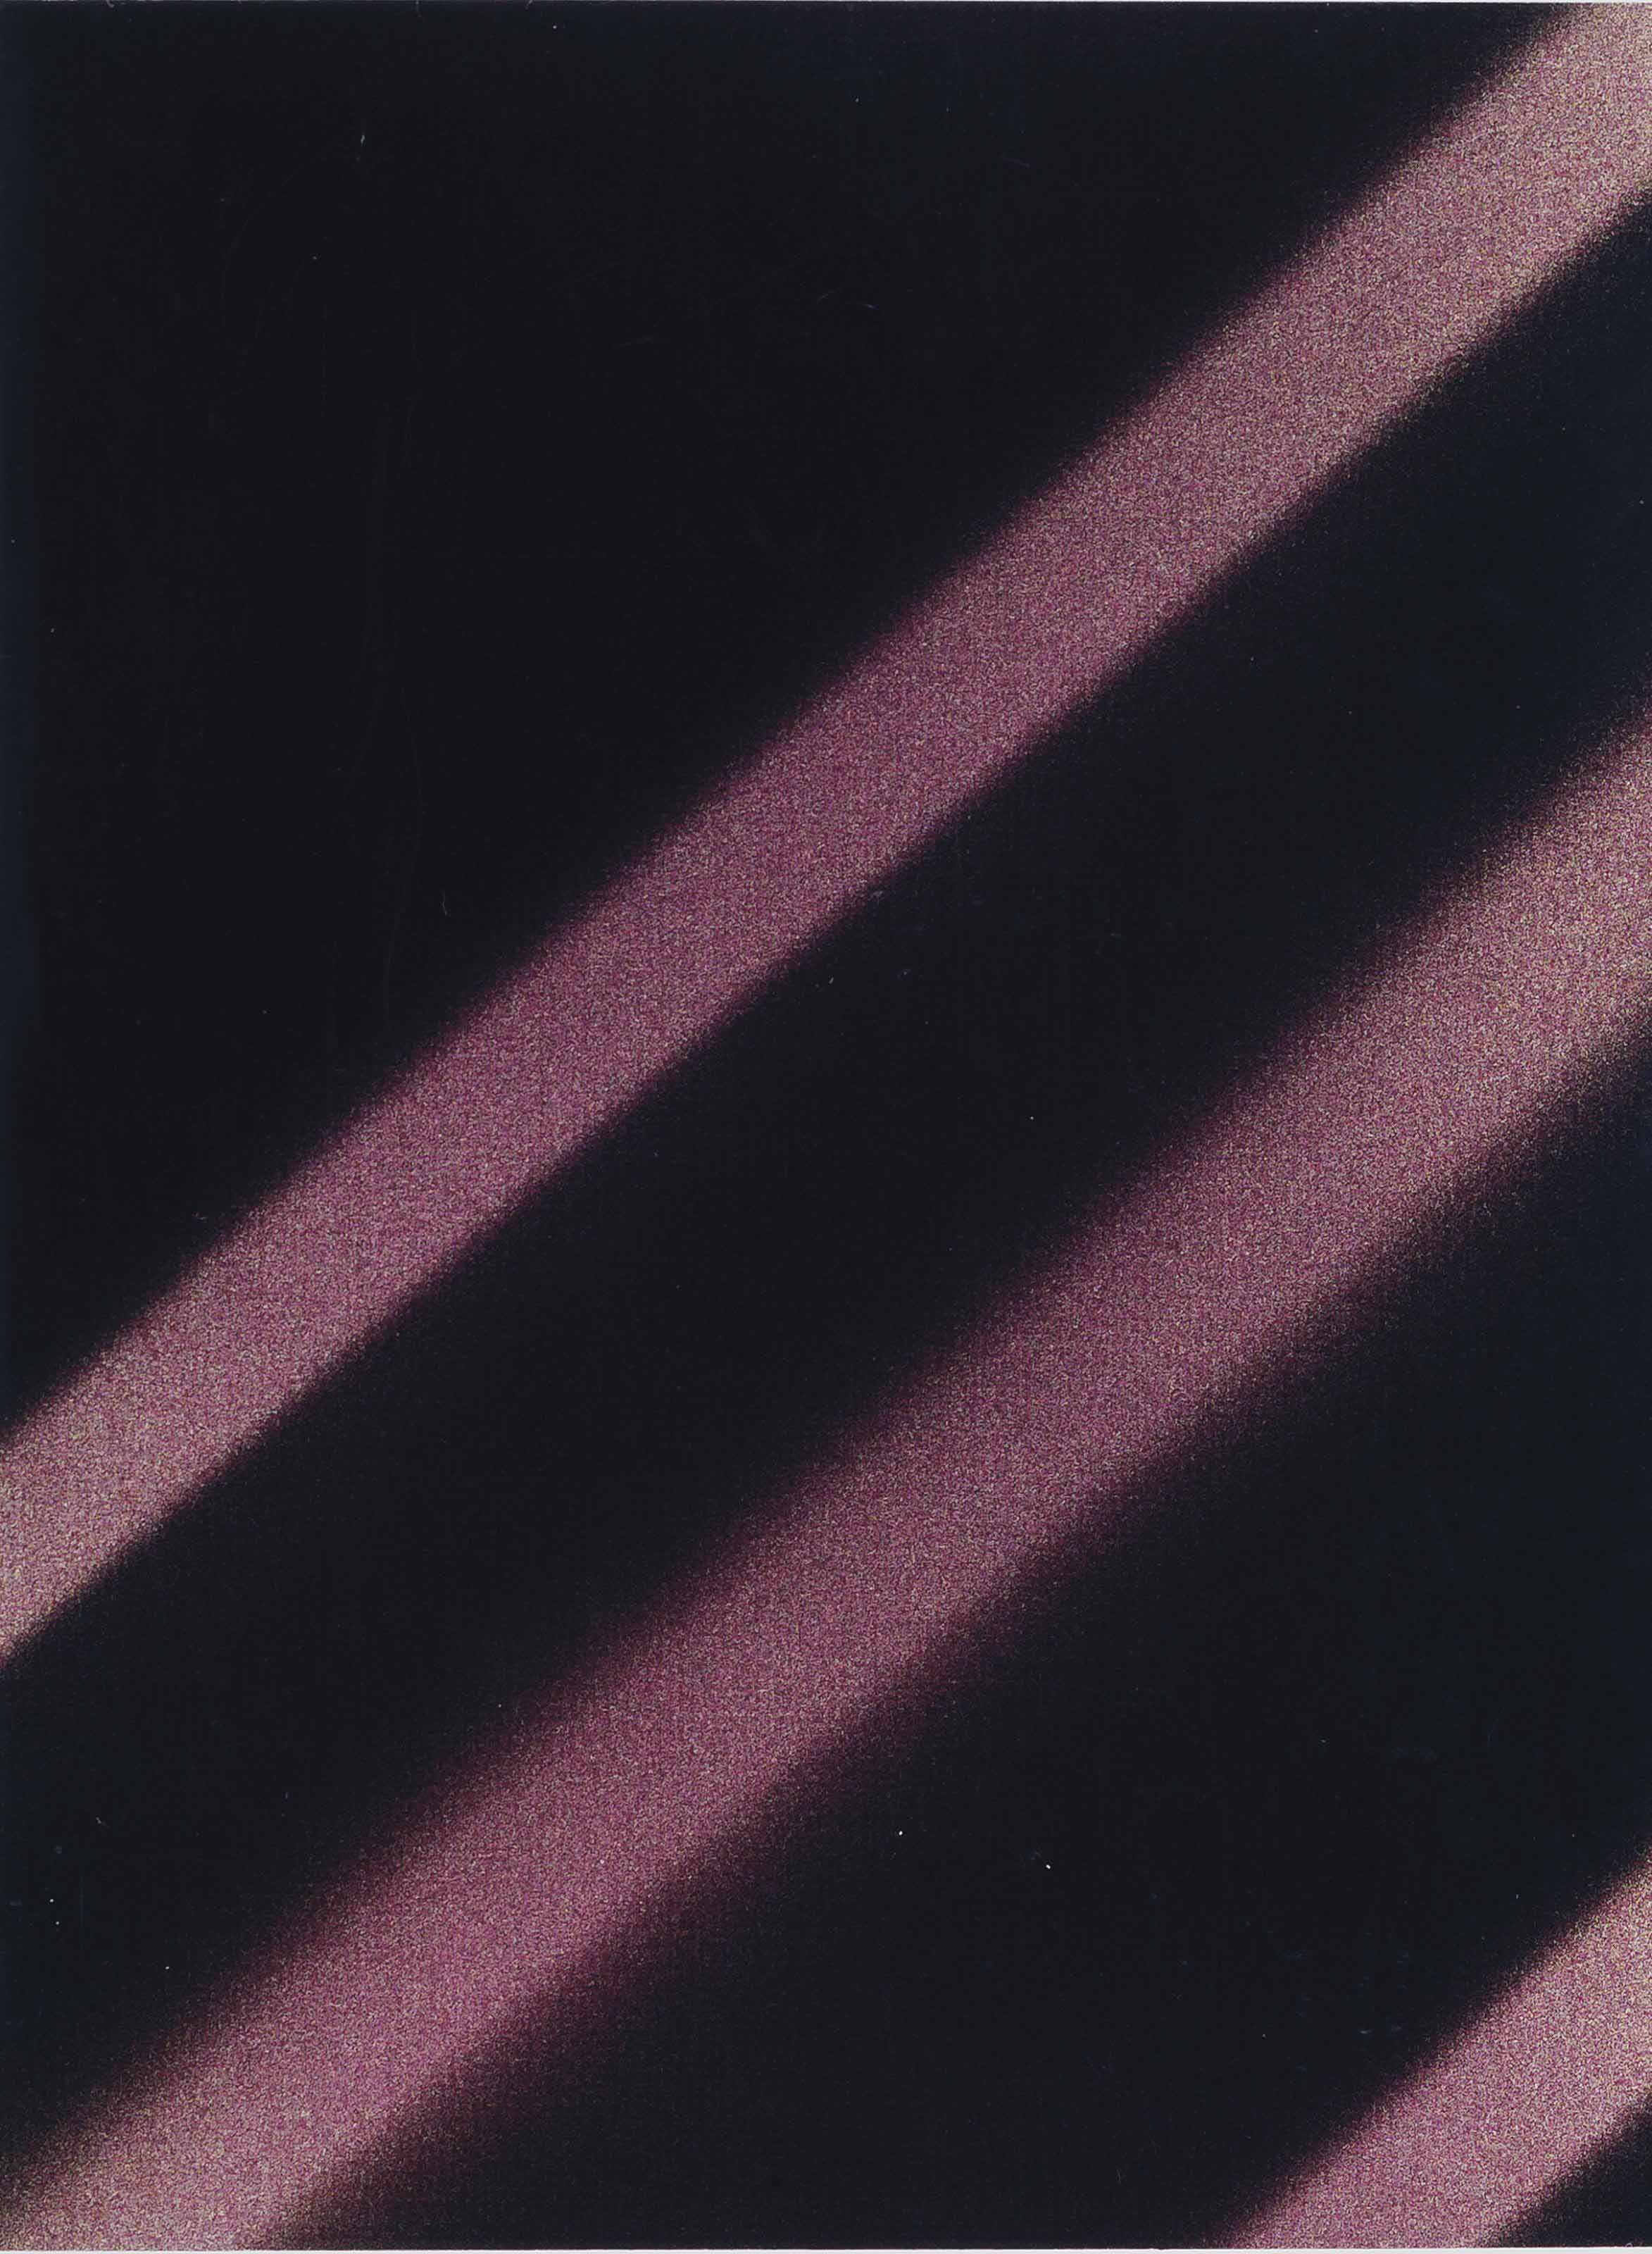 X-Ray Amethyst *(photographic transparency, LAX/JKF/JFK/LAX, 240 0.7rp 6.0 6.9 #BB6C8A)